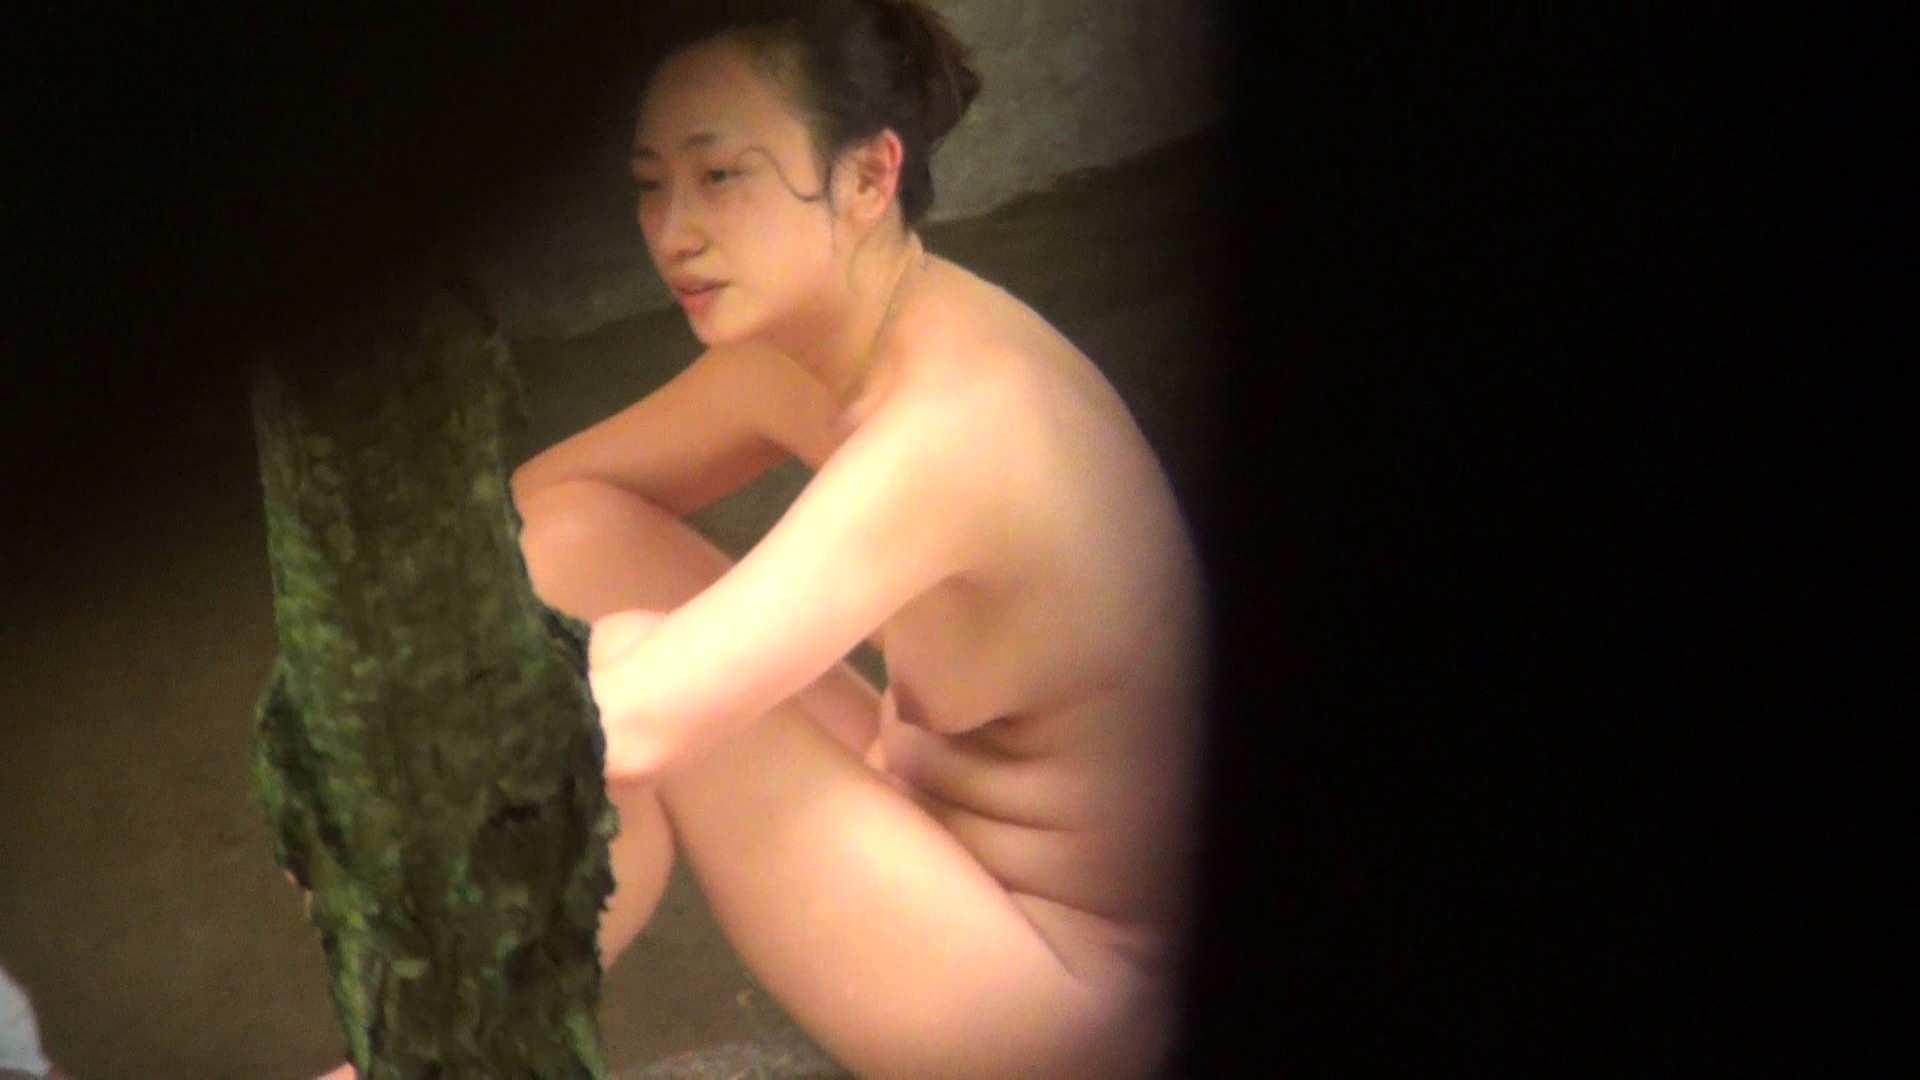 Aquaな露天風呂Vol.310 盗撮師作品 セックス画像 72pic 62